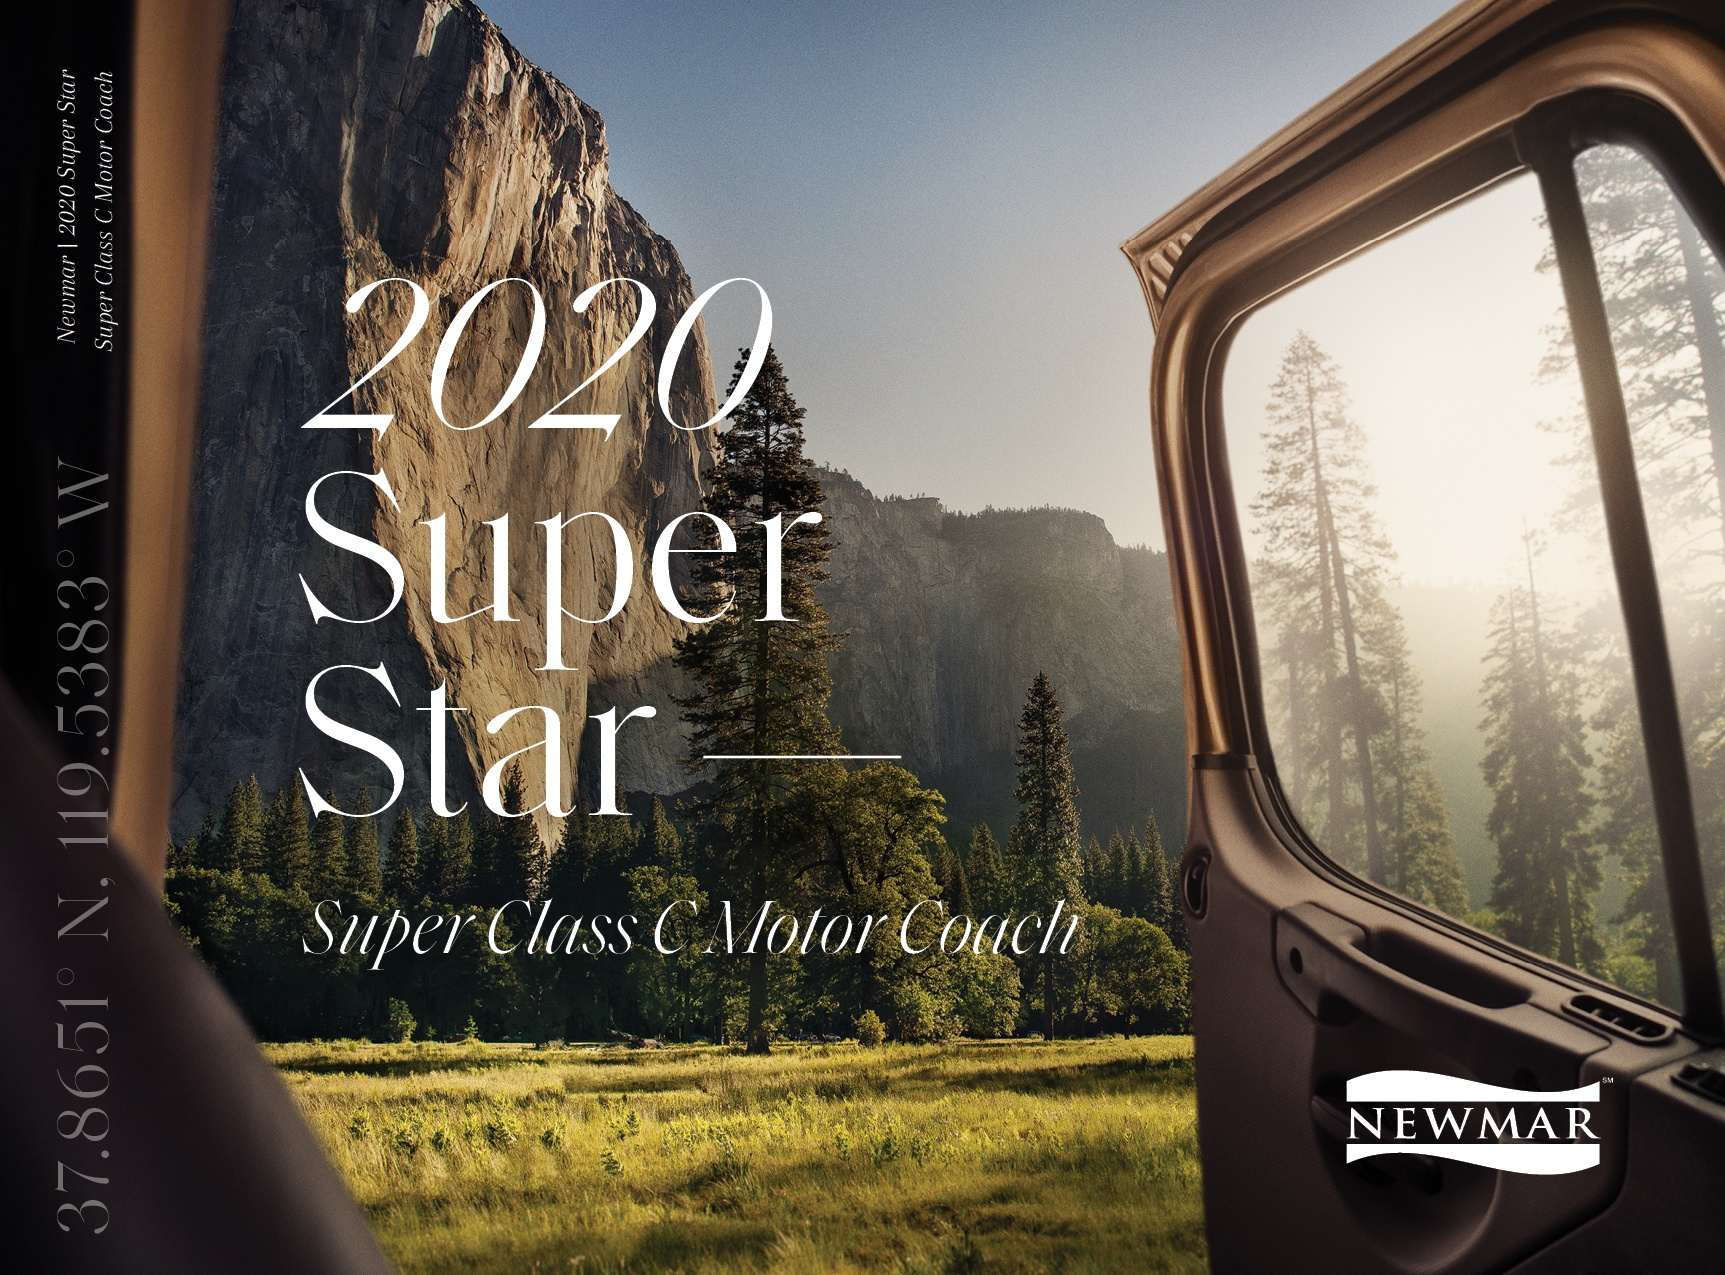 2020 Super Star